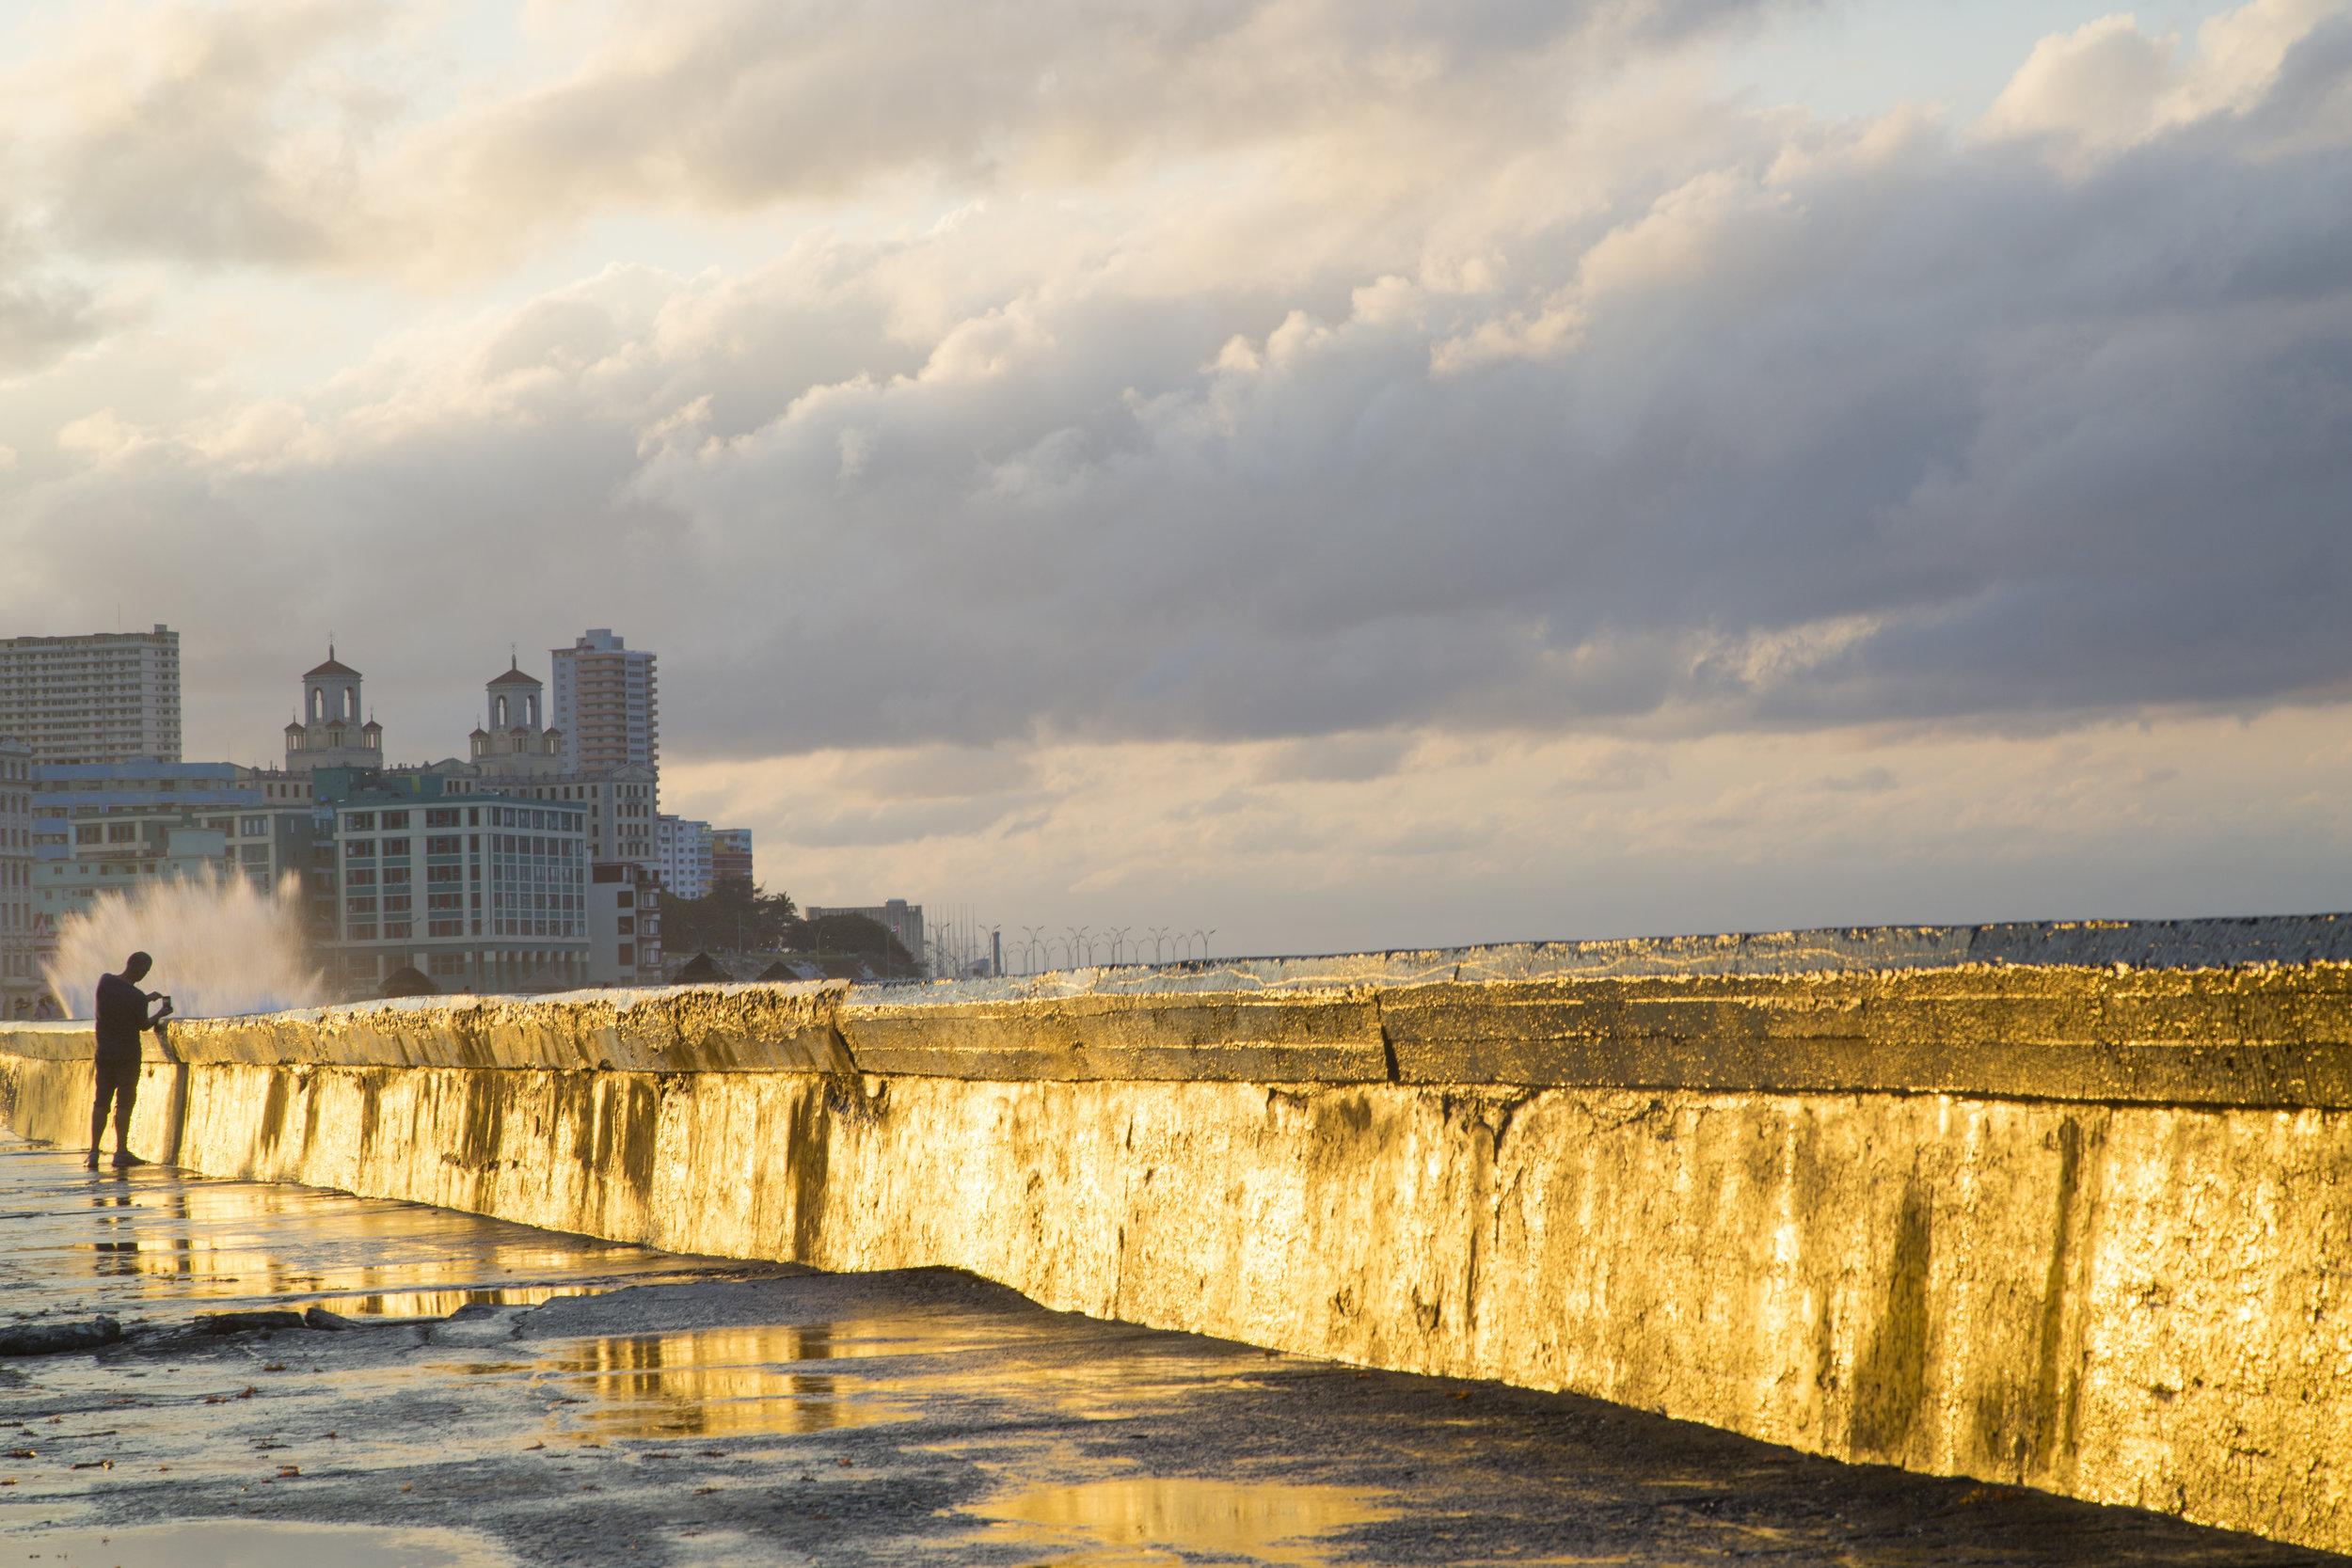 along the Malecon, Havana, Cuba